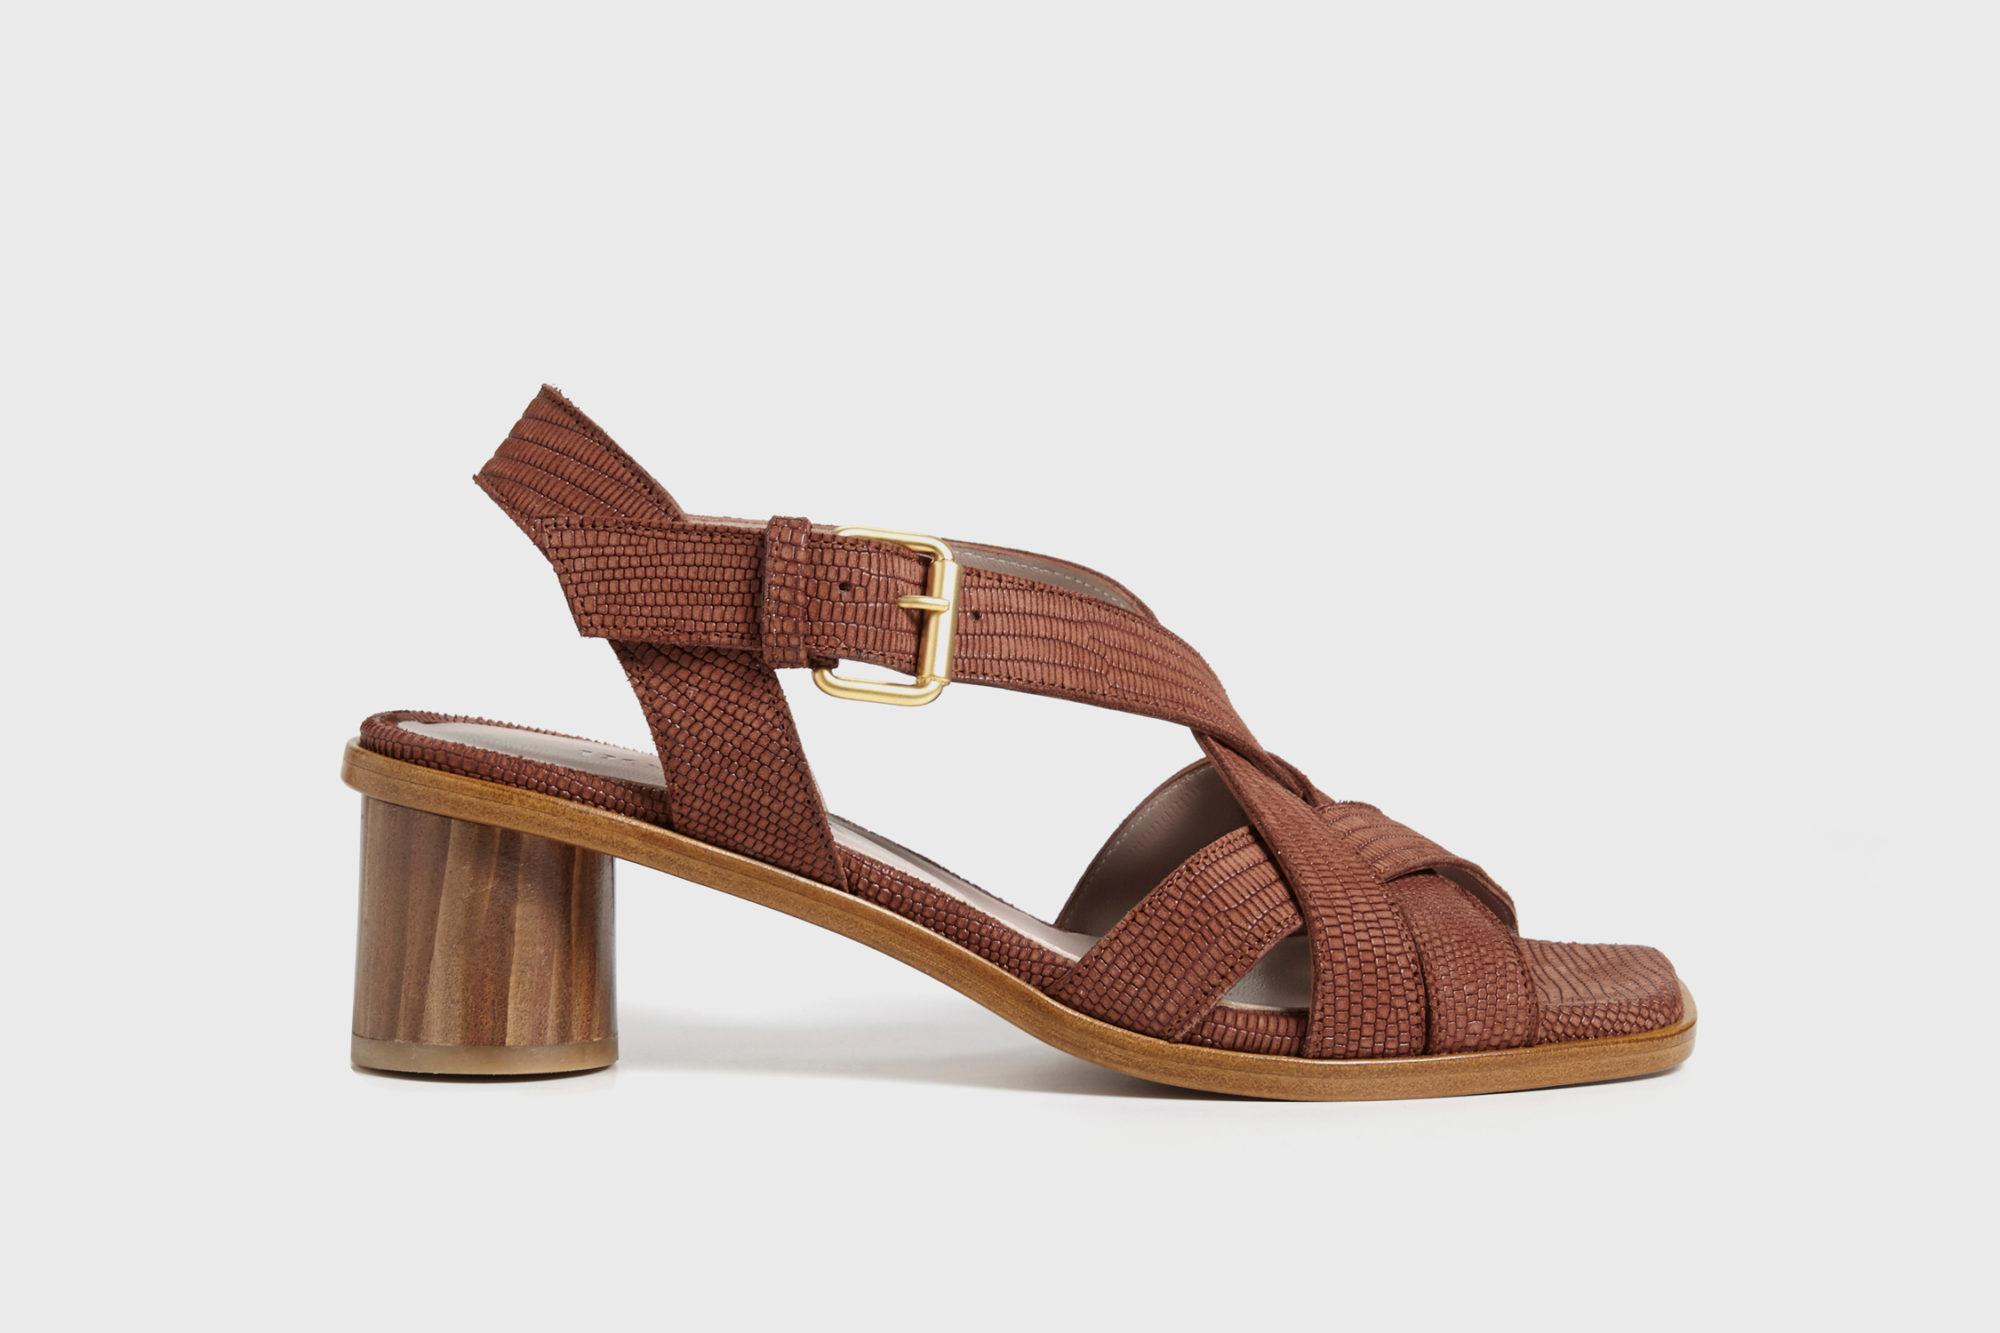 Dorotea sandalia de tacón medio Jeanne marrón ss17 perfil